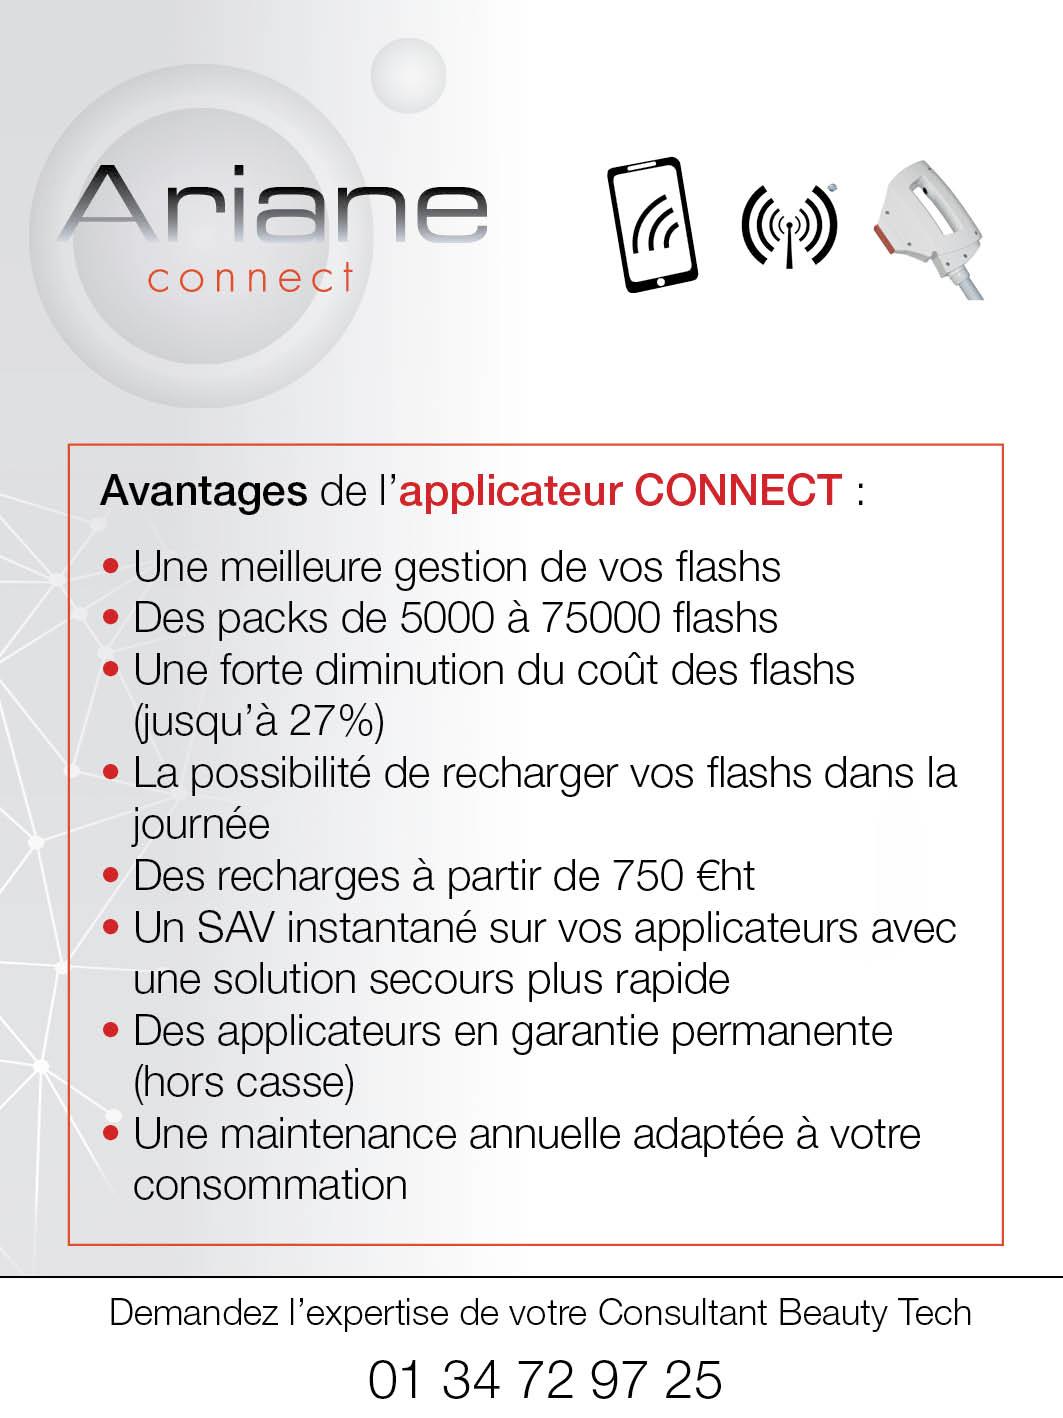 Ariane Connect